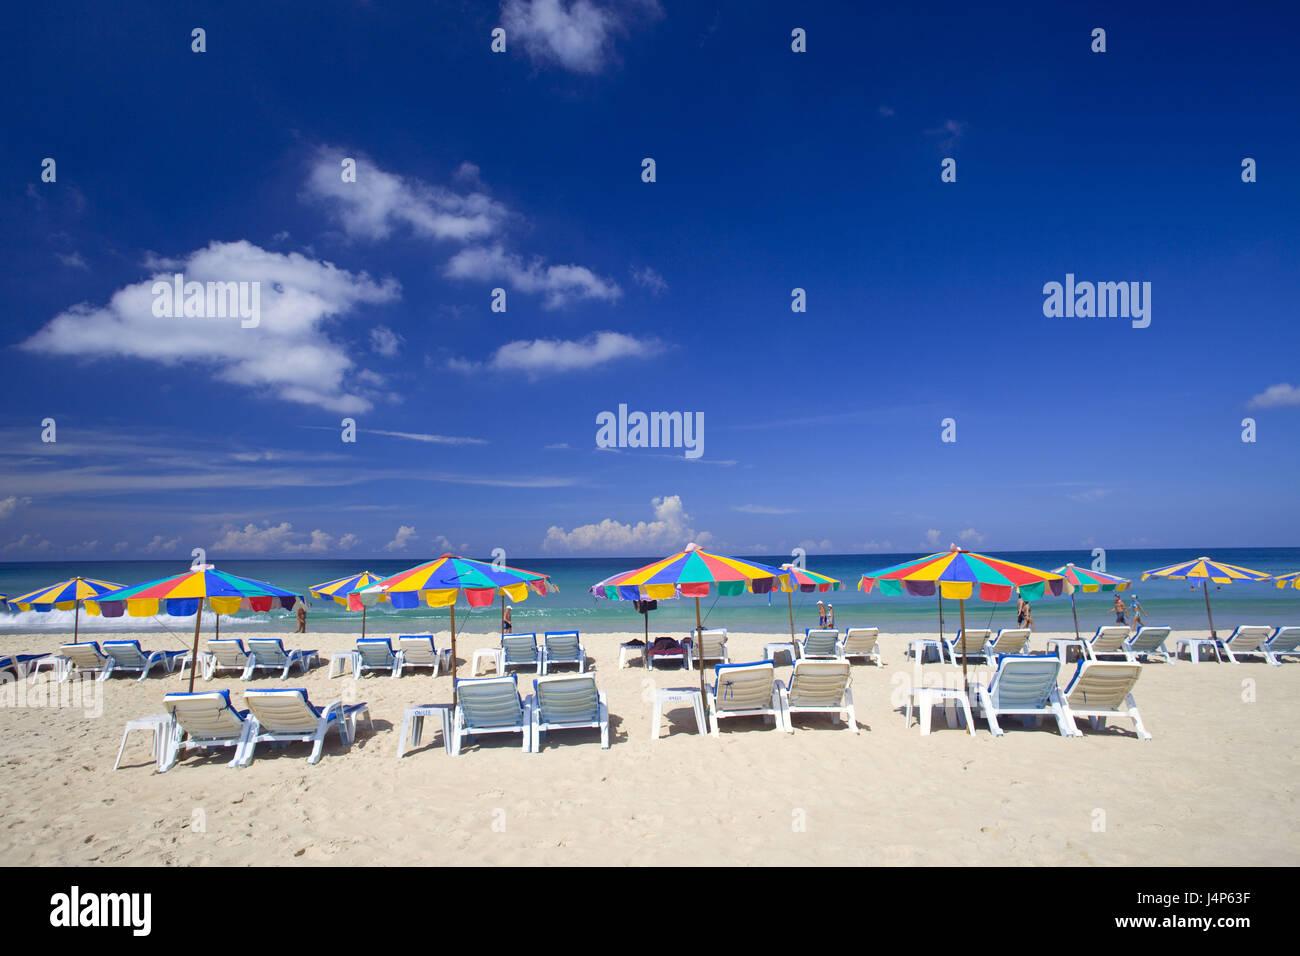 Thailand, Phuket, Karon Beach, deck chairs, sunshades, - Stock Image